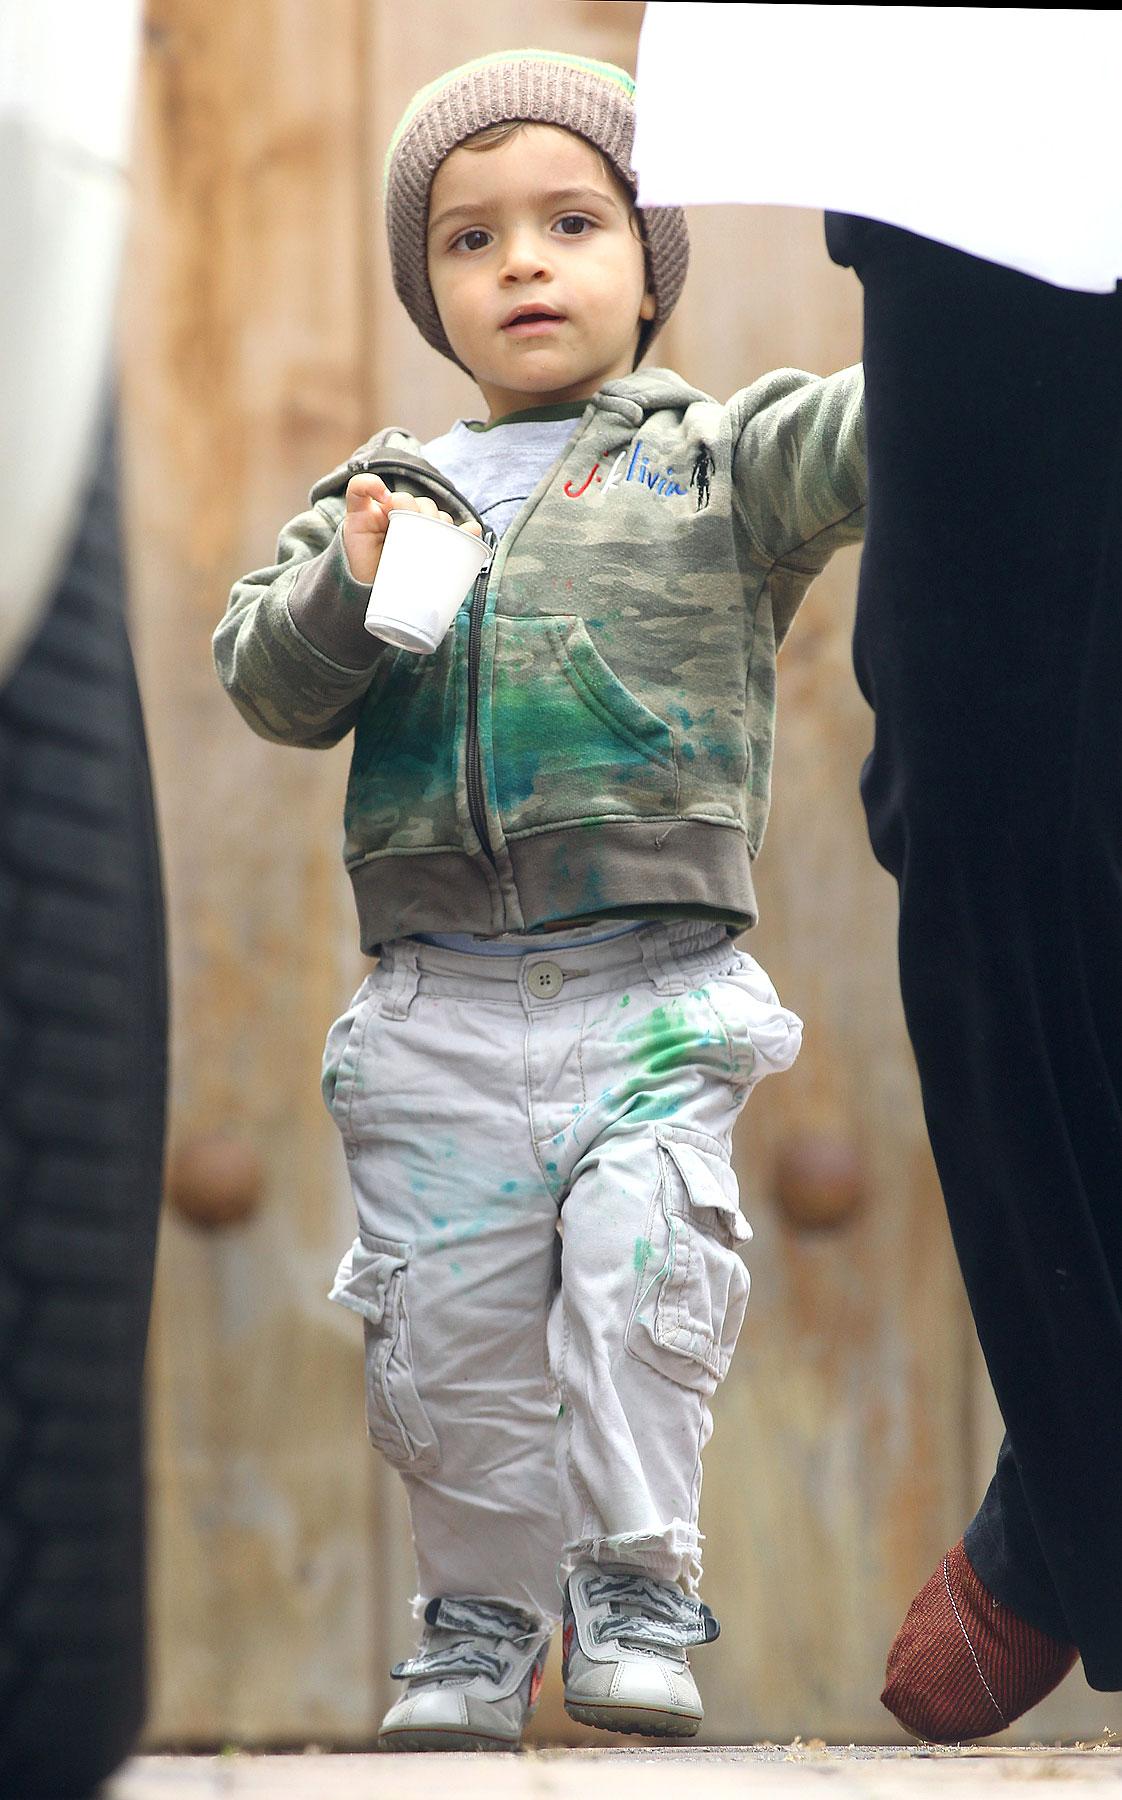 Levi McConaughey Is So Green (PHOTOS)